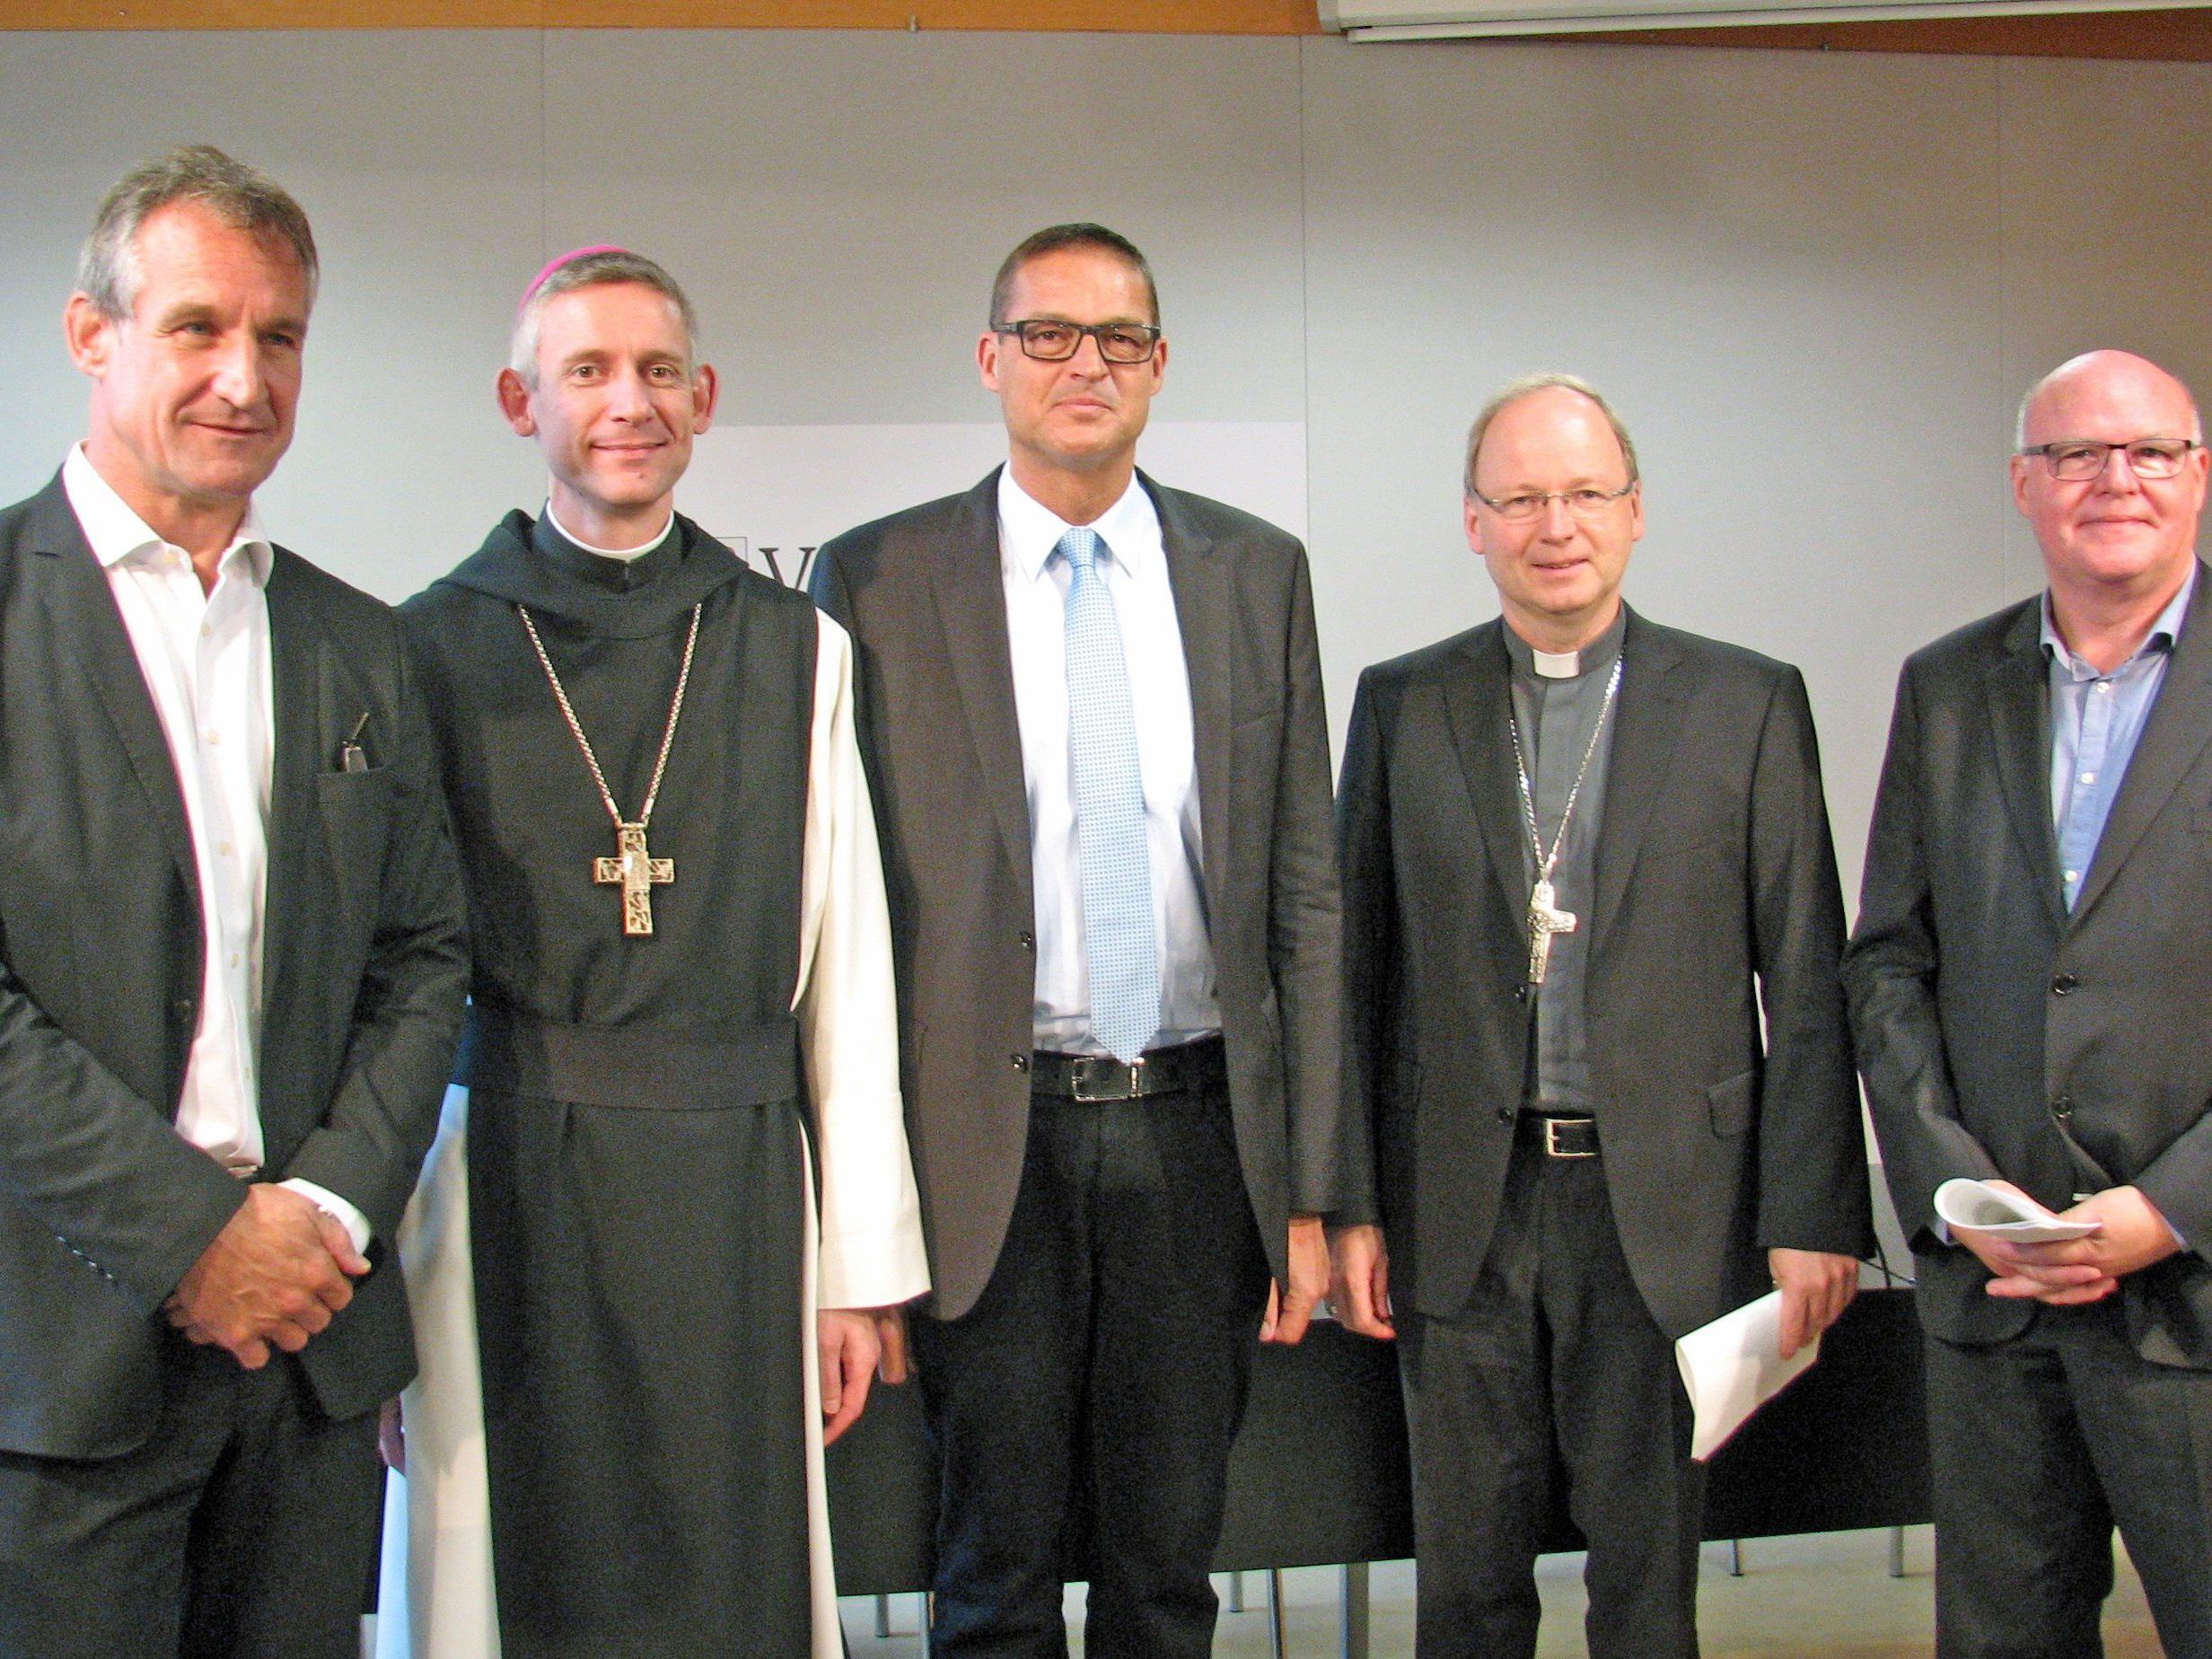 Bgm. Markus Linhart, Abt Anselm van der Linde, Landesrat Christian Bernhard, Bischof Benno Elbs und Caritas-Direktor Peter Klinger